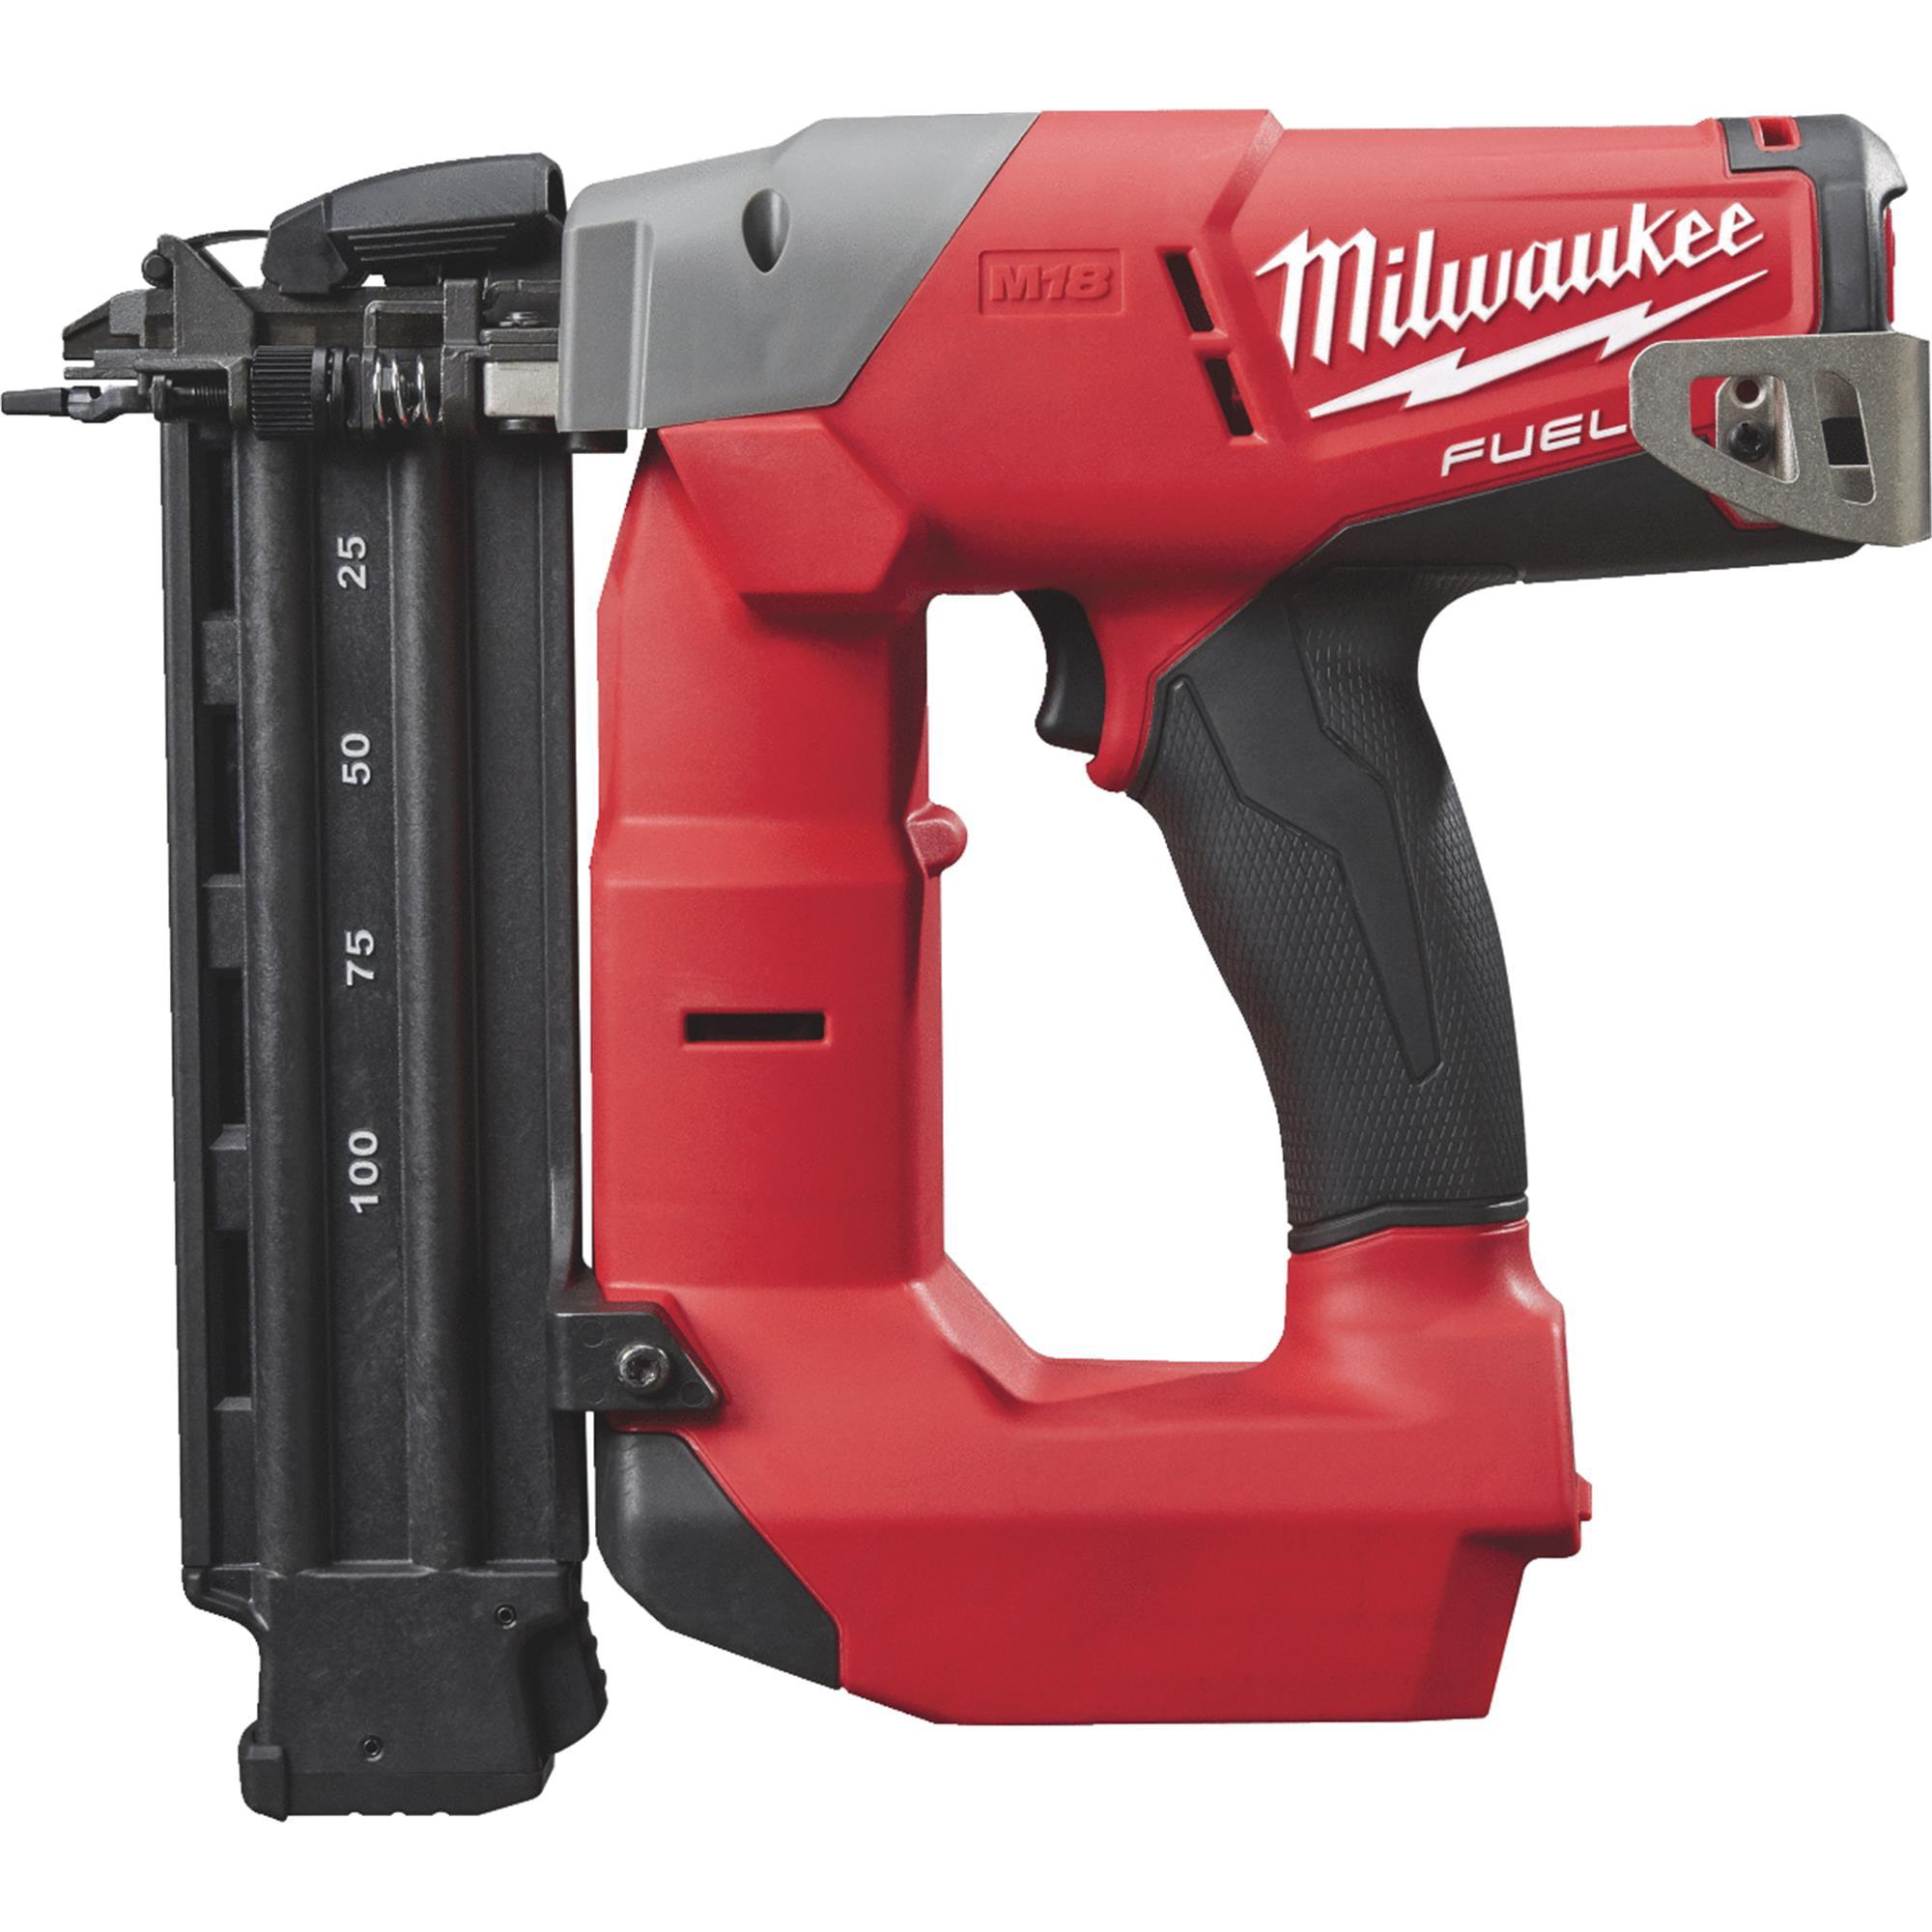 Milwaukee M18 FUEL Brushless Cordless Brad Nailer Bare Tool by Milwaukee Elec.Tool